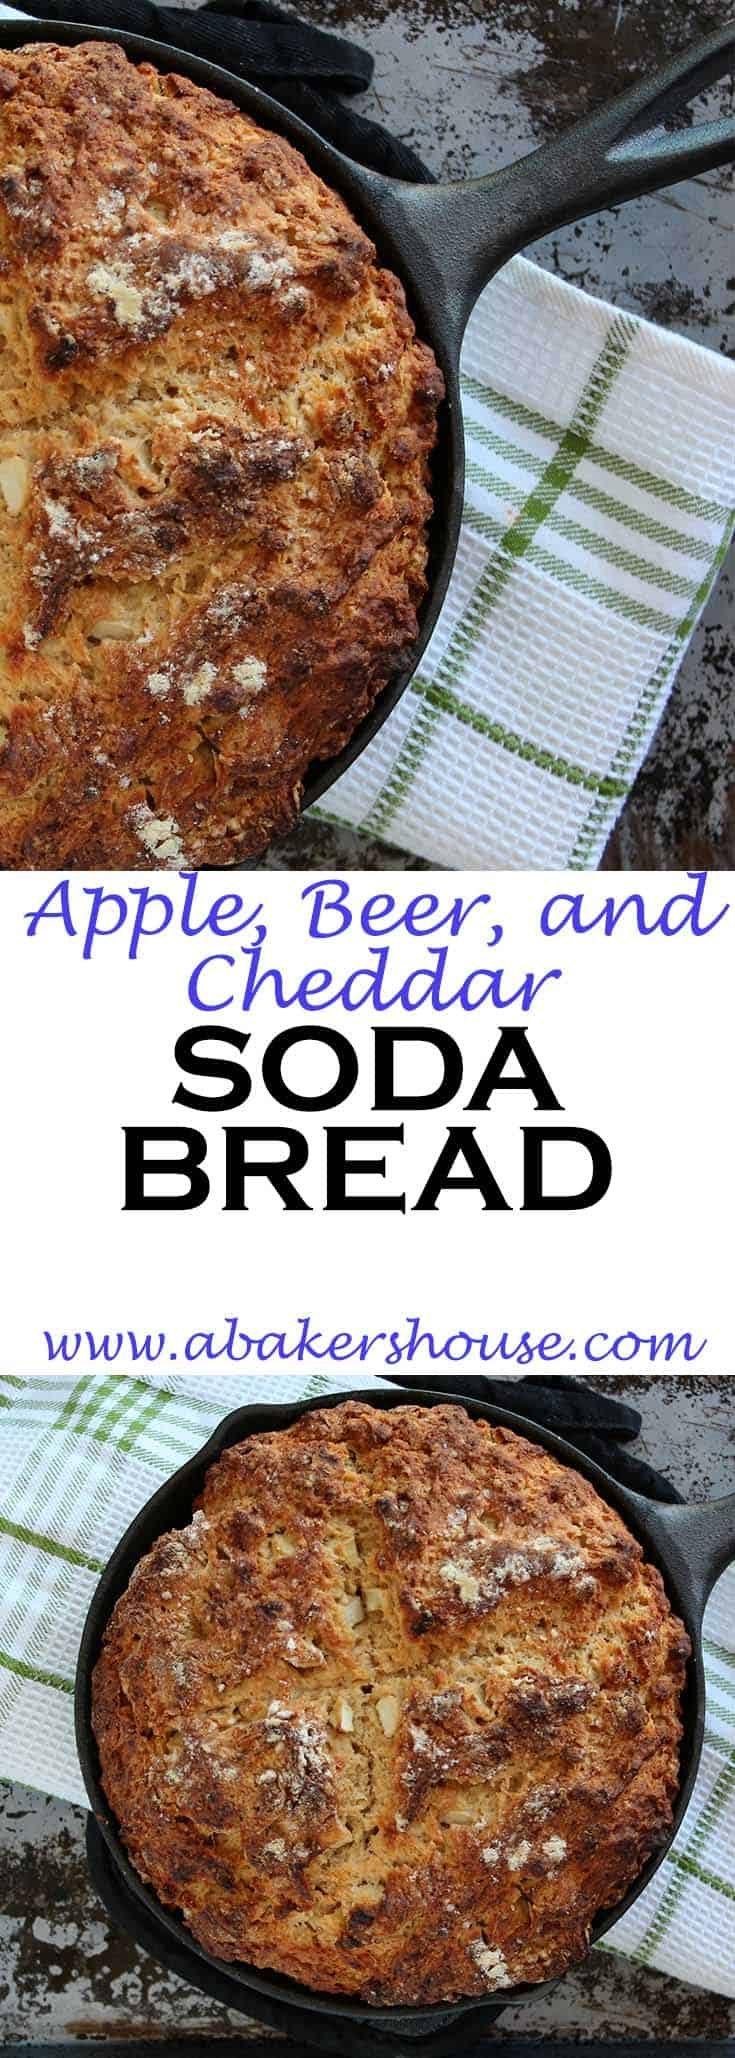 Apple, beer and cheddar soda bread is a variation on good old Irish Soda Bread. #abakershouse #irish #sodabread #beerbread